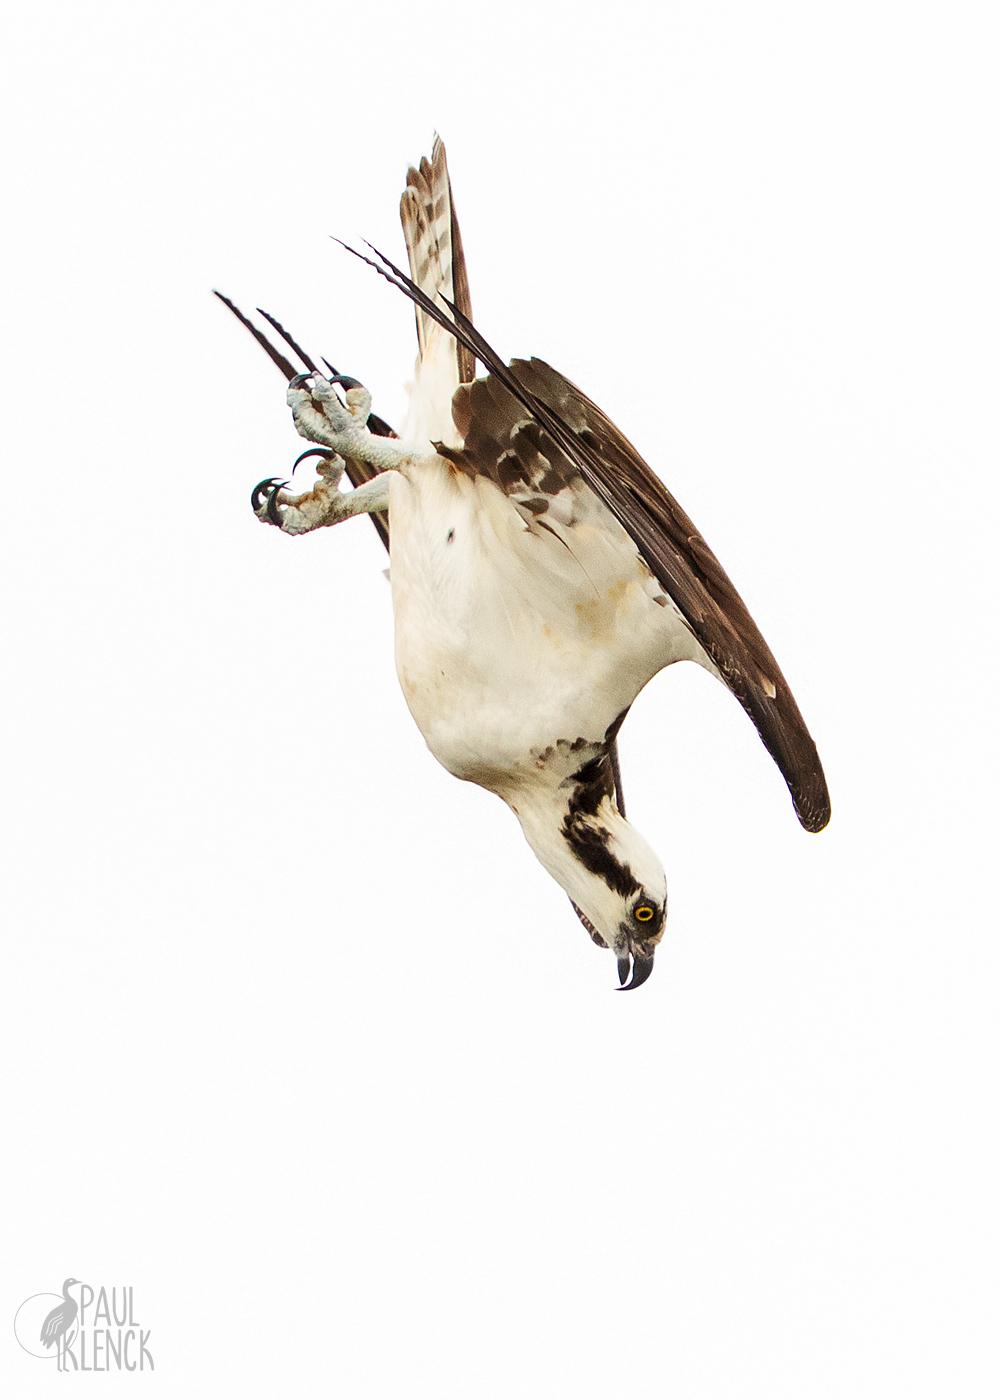 Osprey a/k/a Fishhawk, Goodwin Waterfowl Management Area, Brevard County, FL